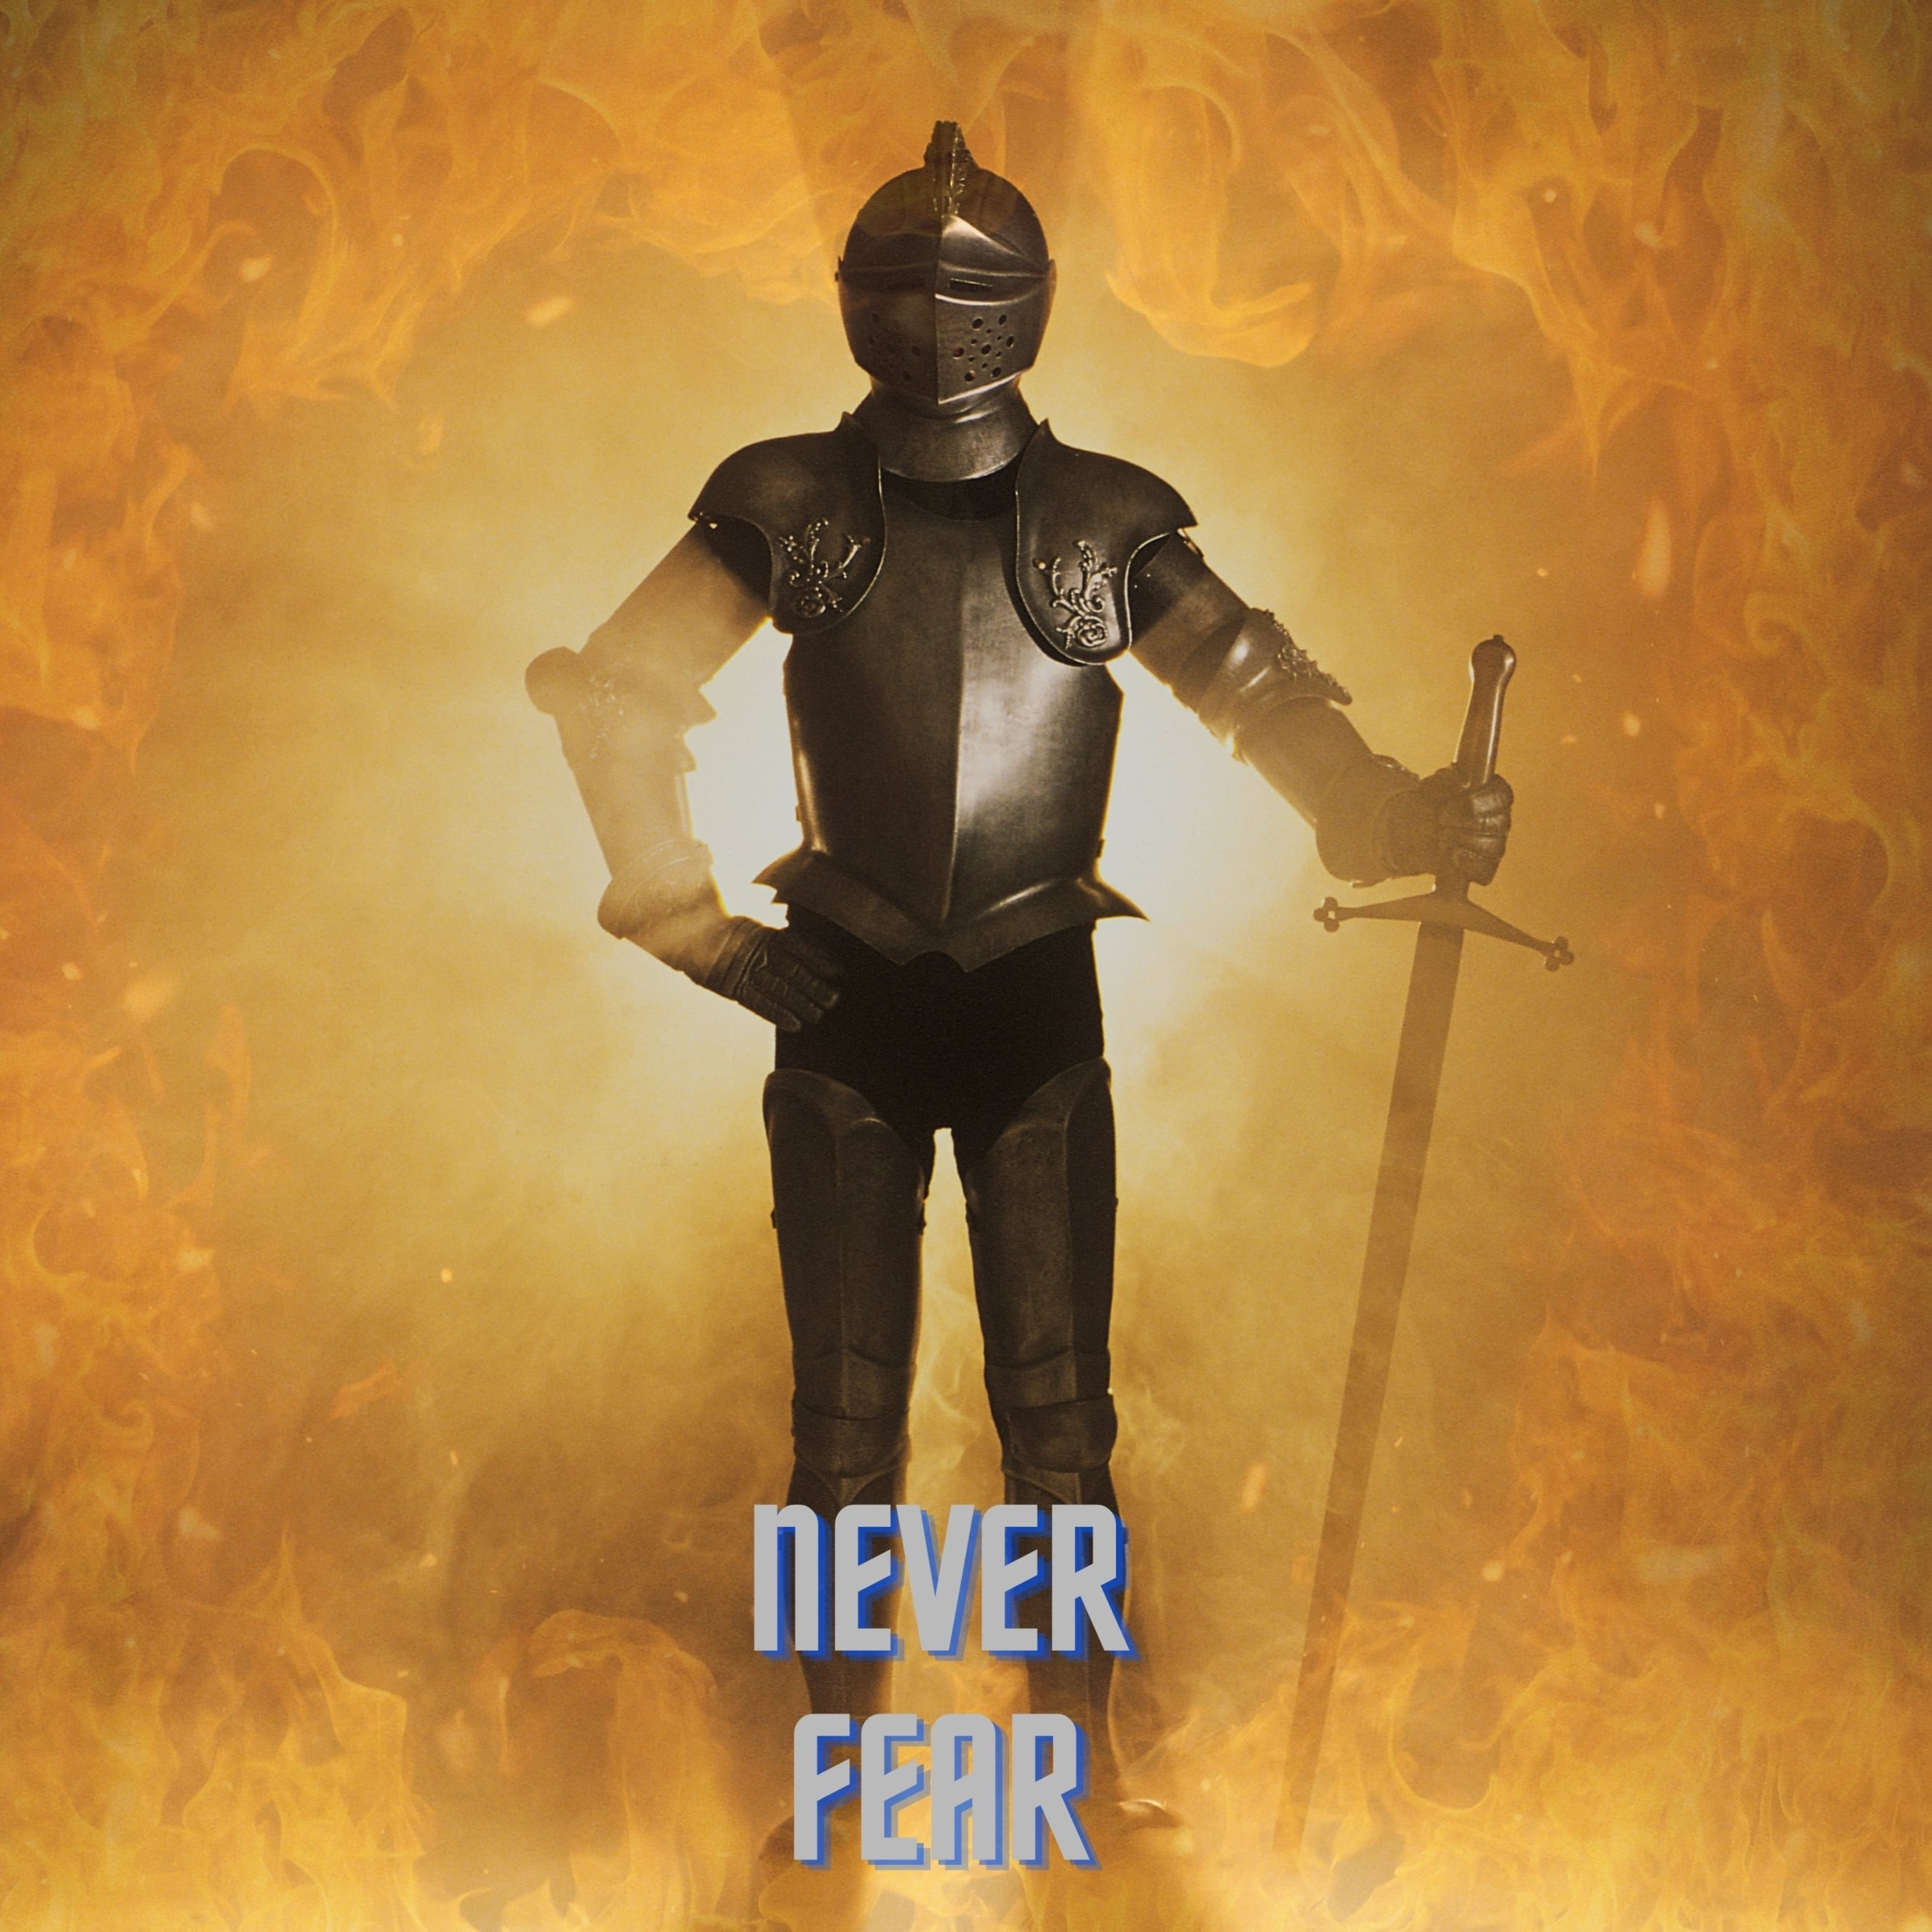 Never Fear knight Ipad Wallpaper